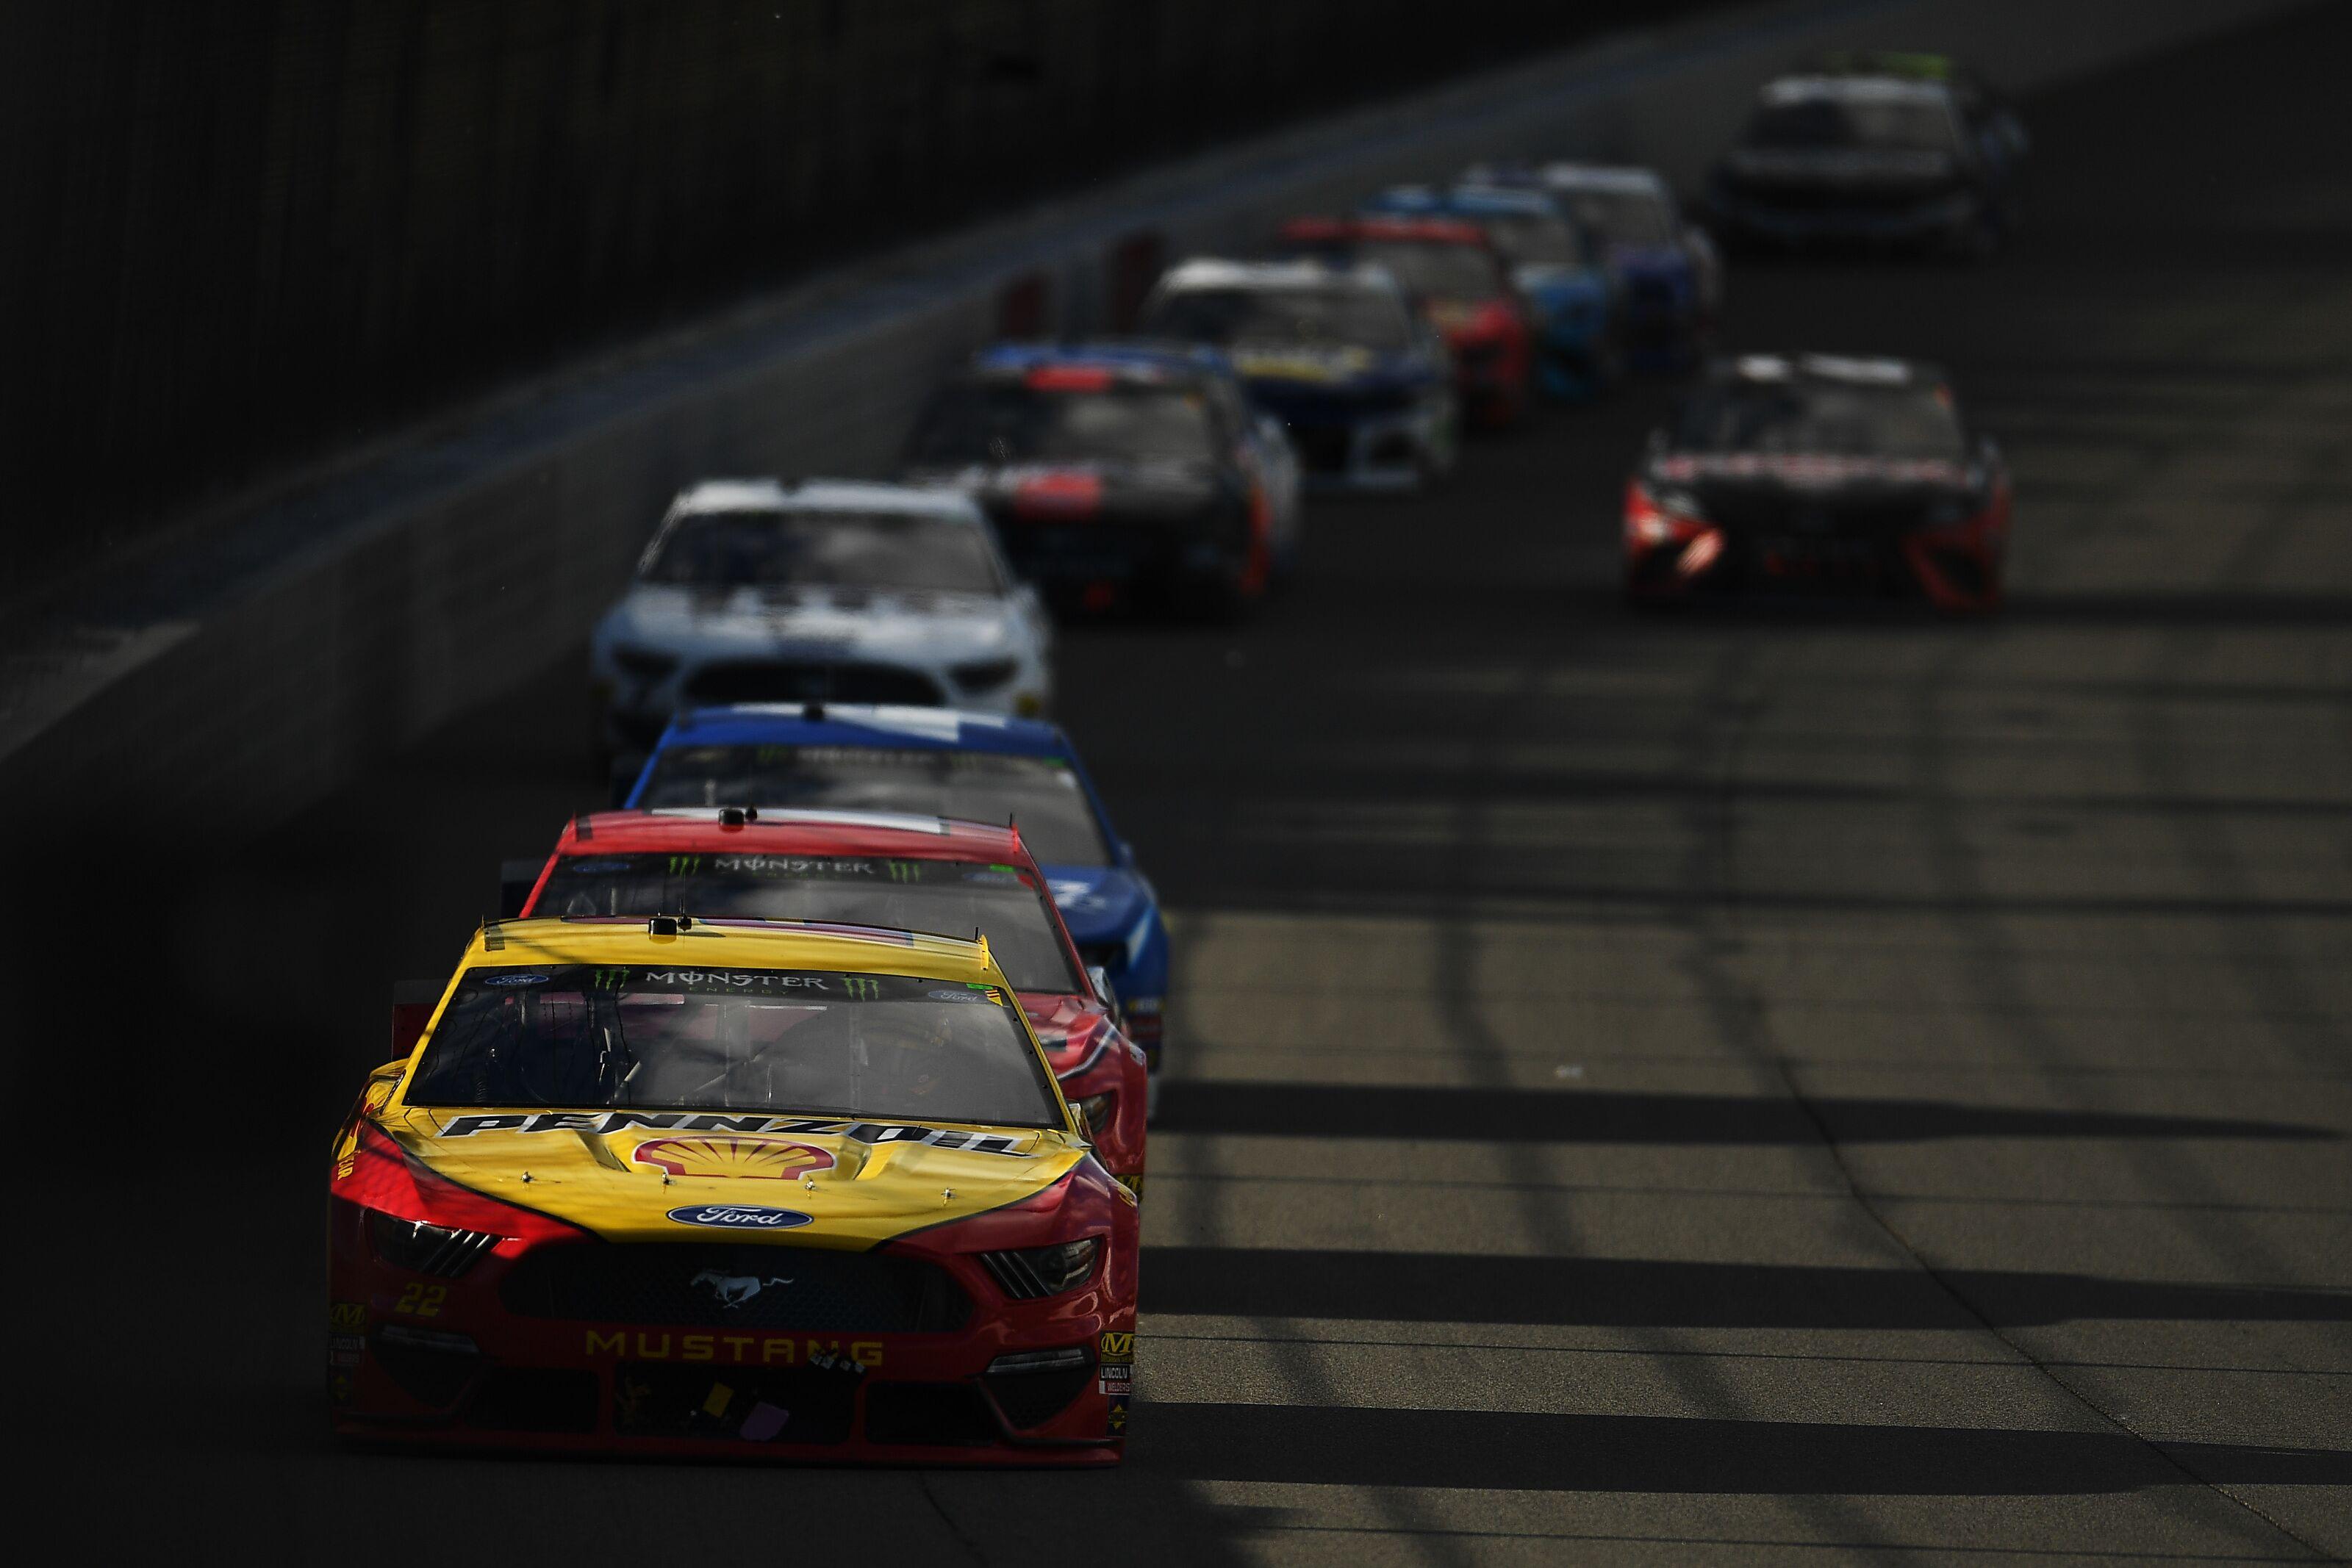 NASCAR Cup Series Team Power Rankings after 2019 FireKeepers Casino 400